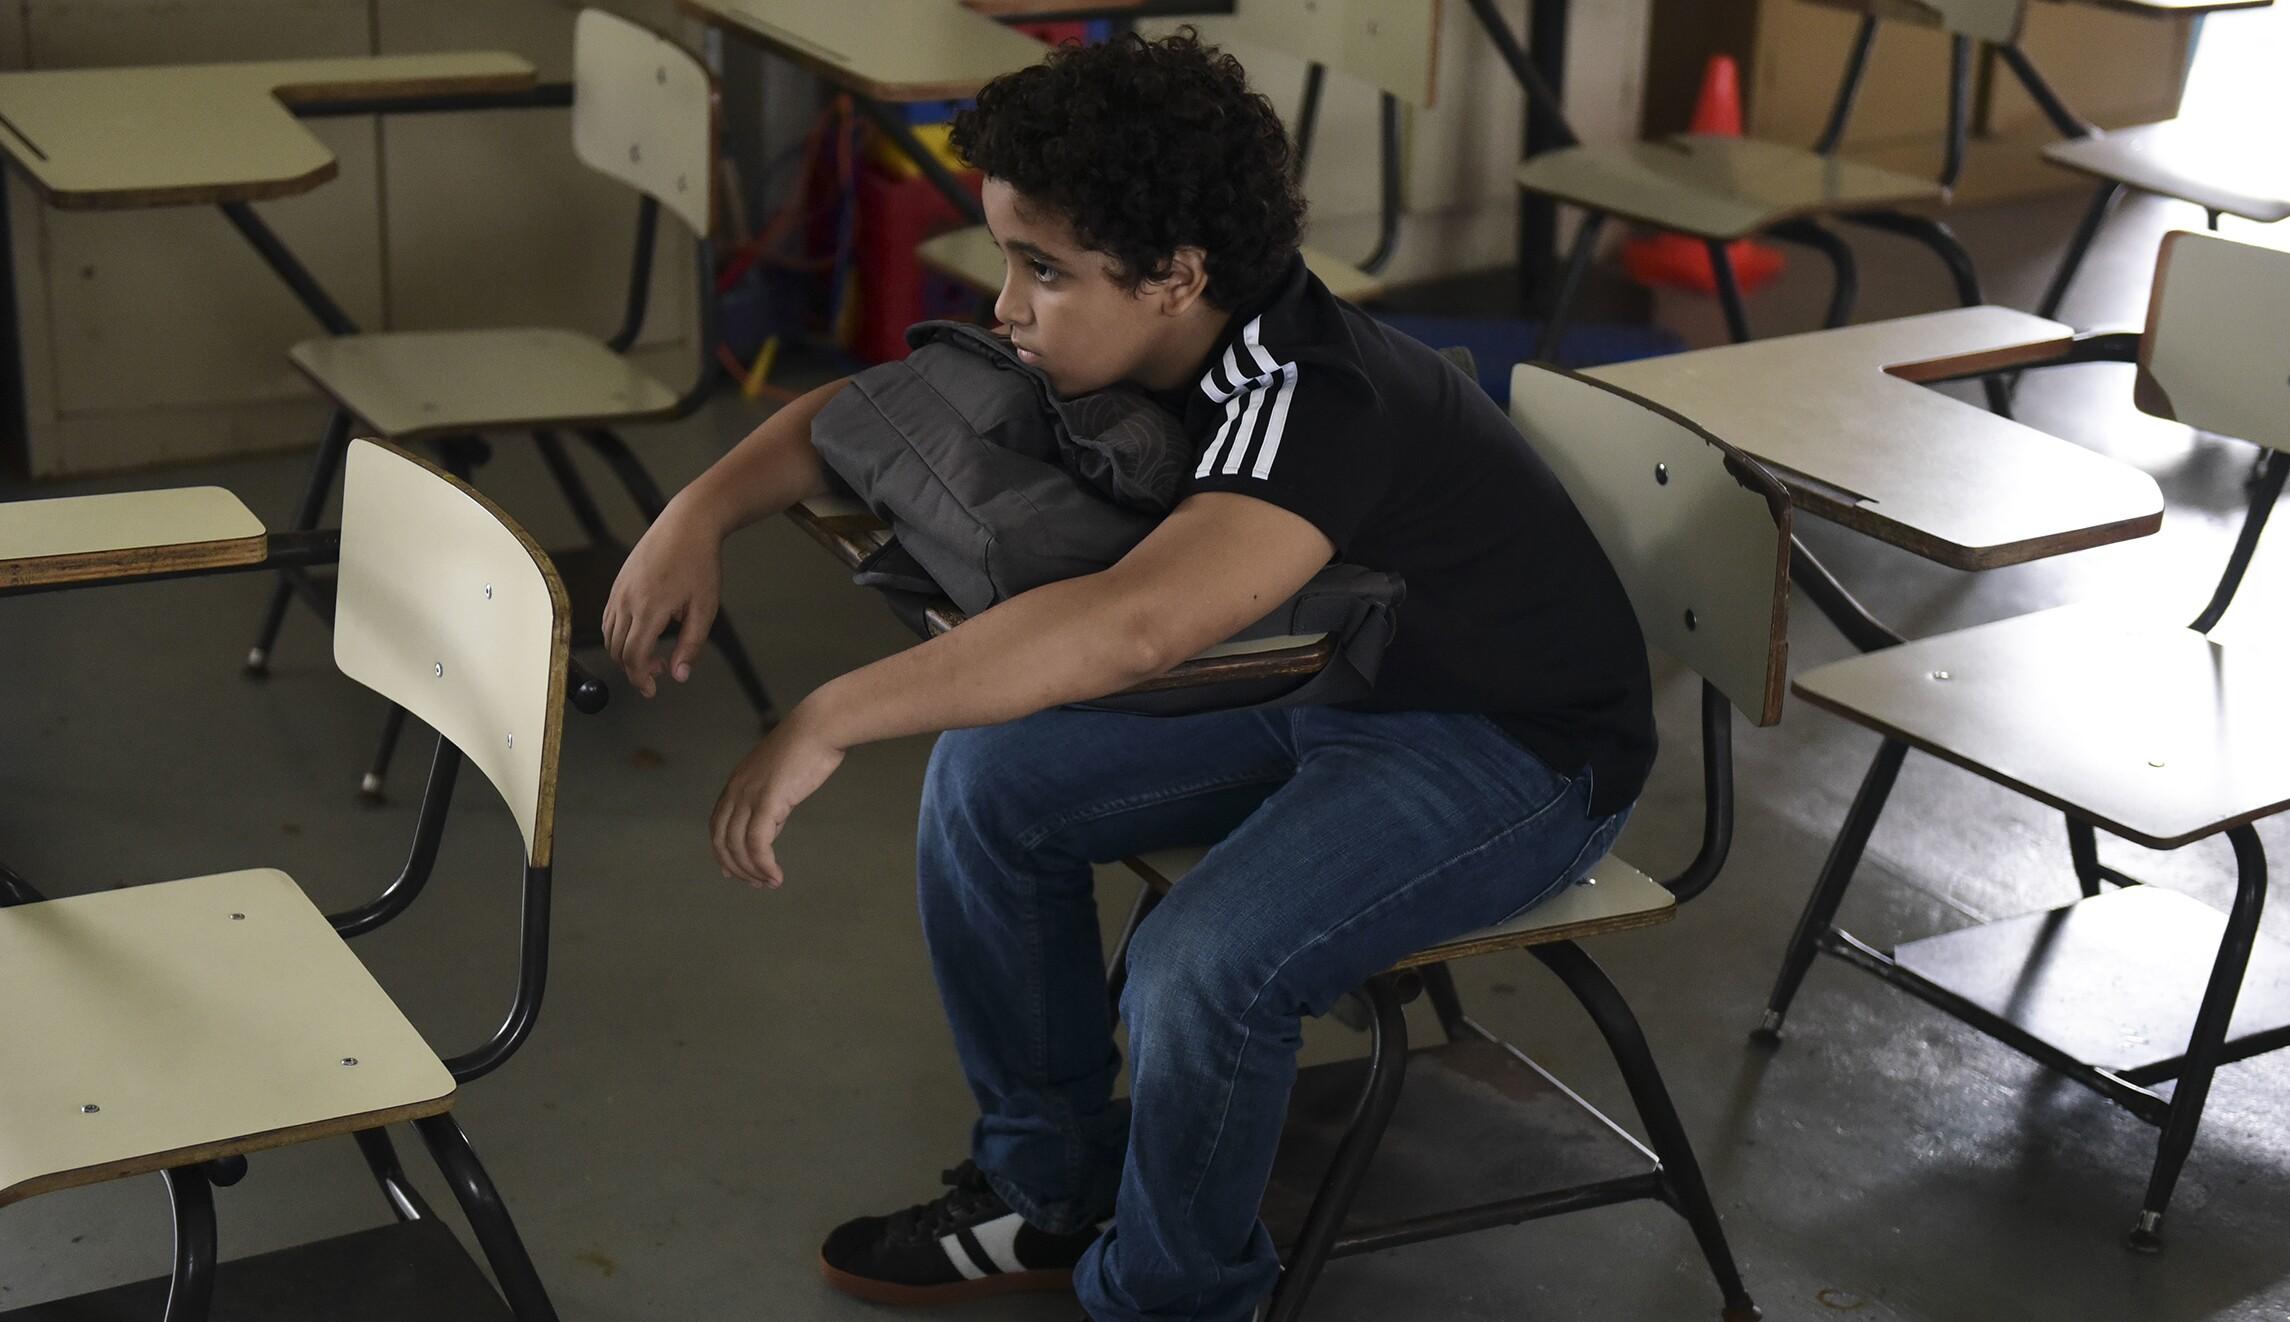 Puerto Rico to close one quarter of its public schools